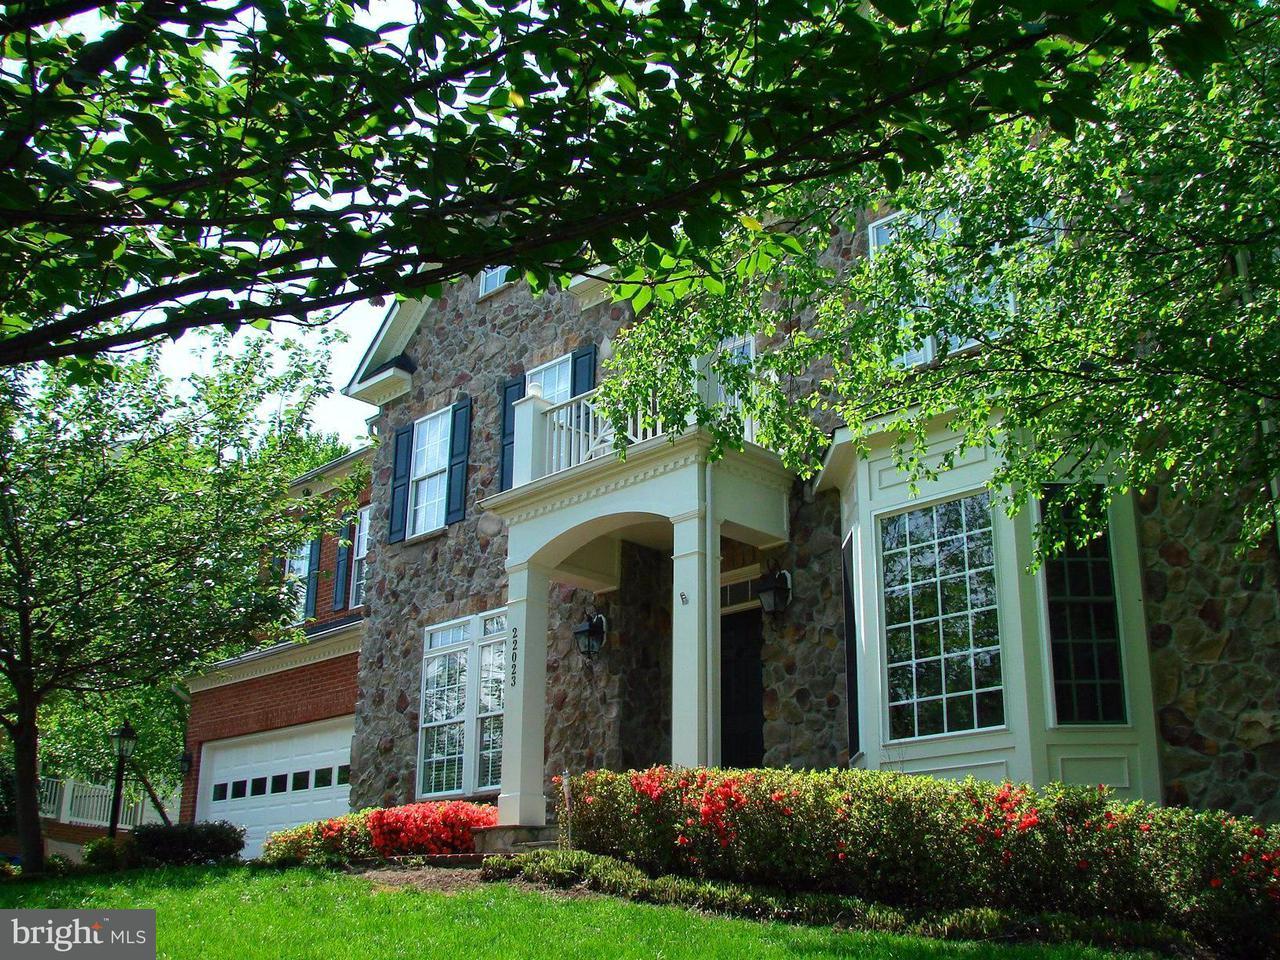 独户住宅 为 销售 在 22023 AYR HILL Court 22023 AYR HILL Court Broadlands, 弗吉尼亚州 20148 美国